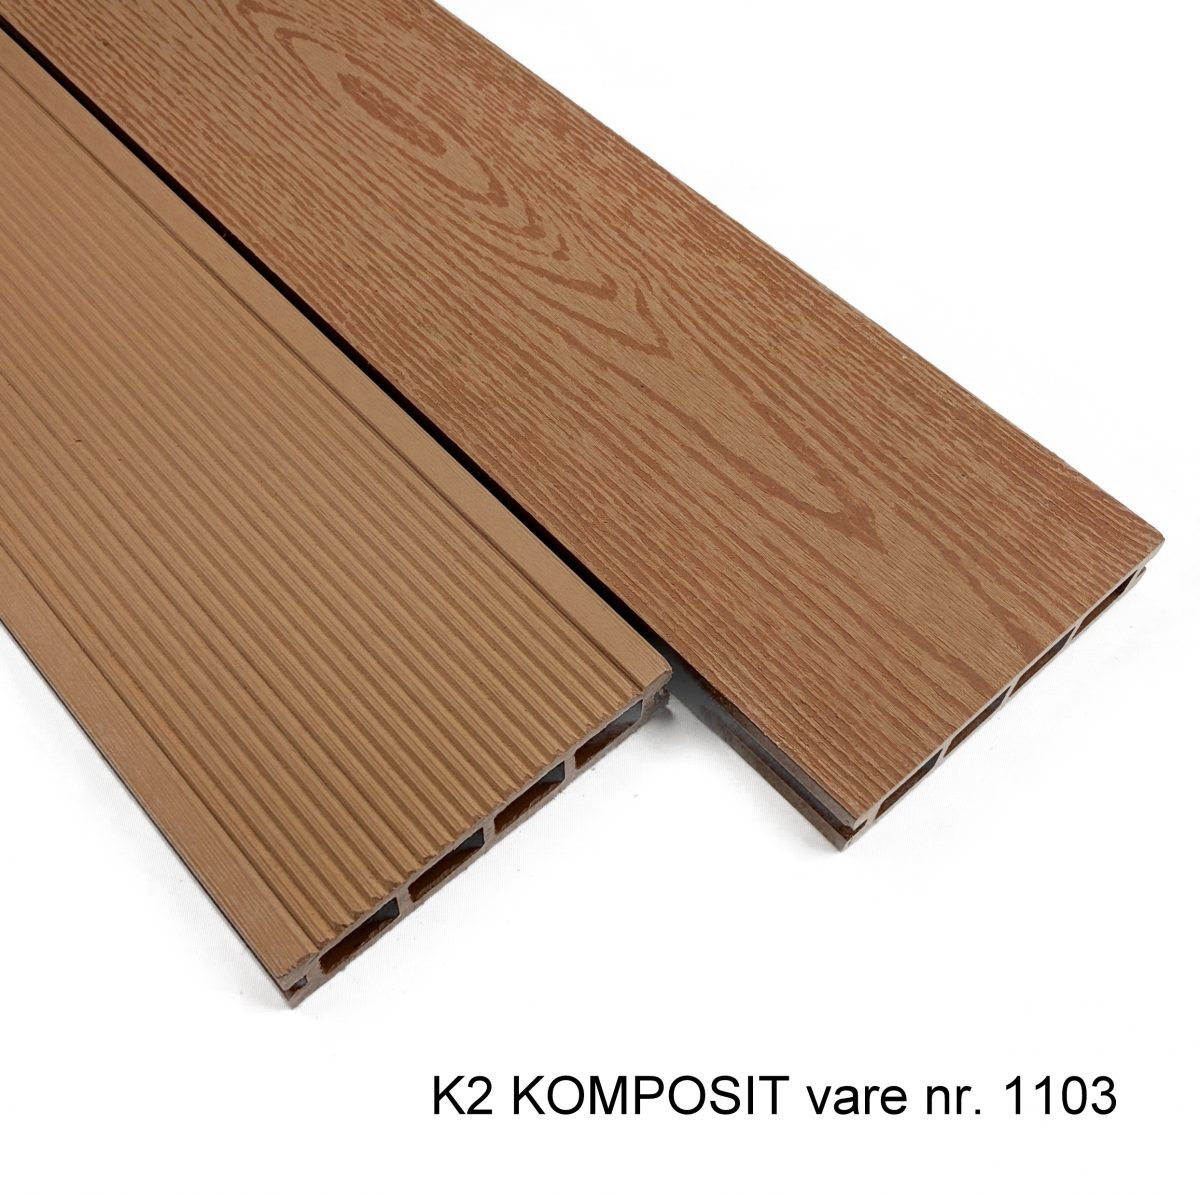 Picture of: K2 Komposit Terrassebraedder Teak Sw 25x135x2220 Mm Borstet Rillet Glat Traestruktur K2 Komposit